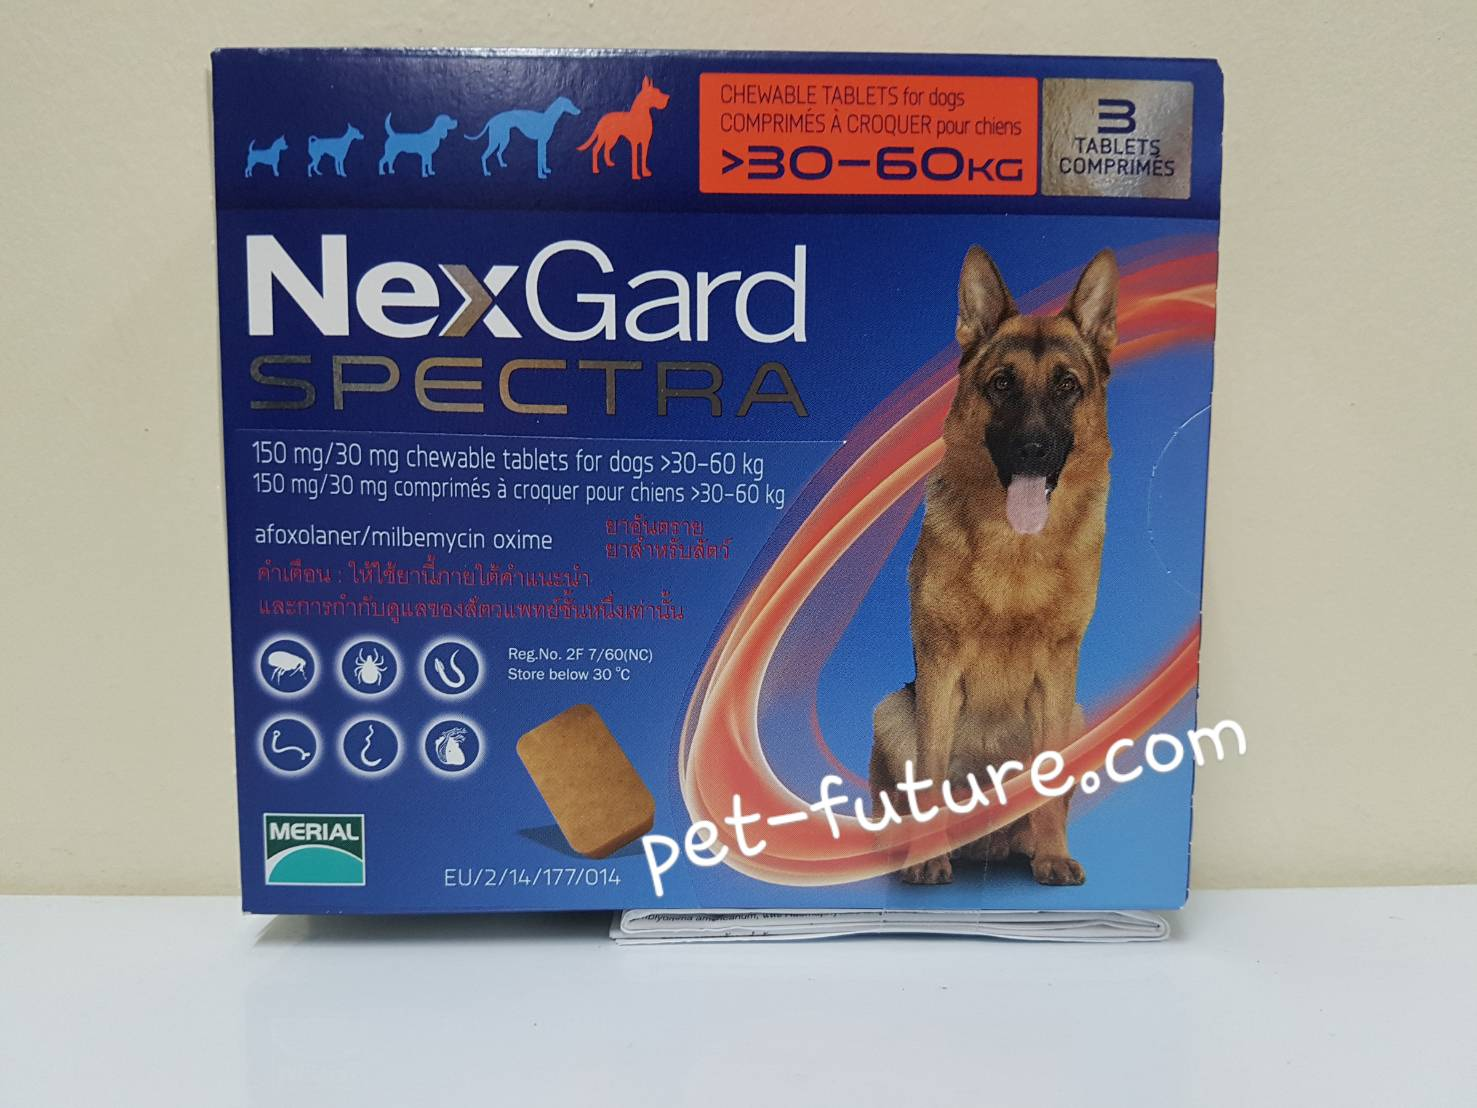 NexGard Spactra 30-60 kg. Exp.09/19 ป้องกันเห็บ หมัด พยาธิหนอนหัวใจ พยาธิทางเดินอาหาร